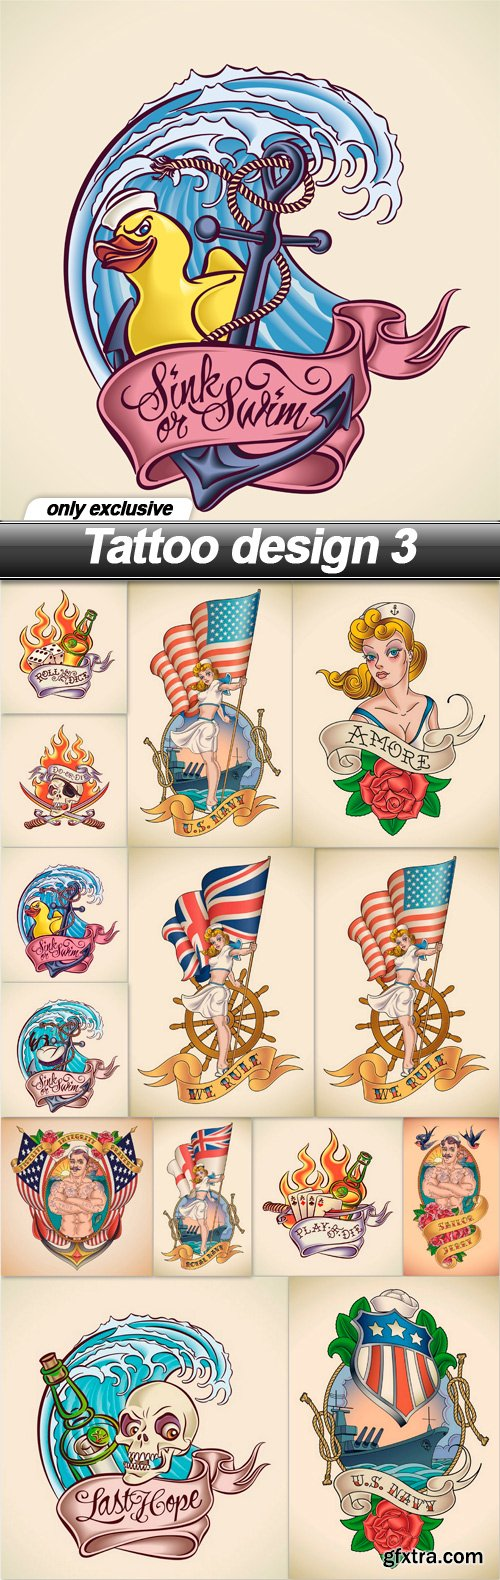 Tattoo design 3 - 14 EPS